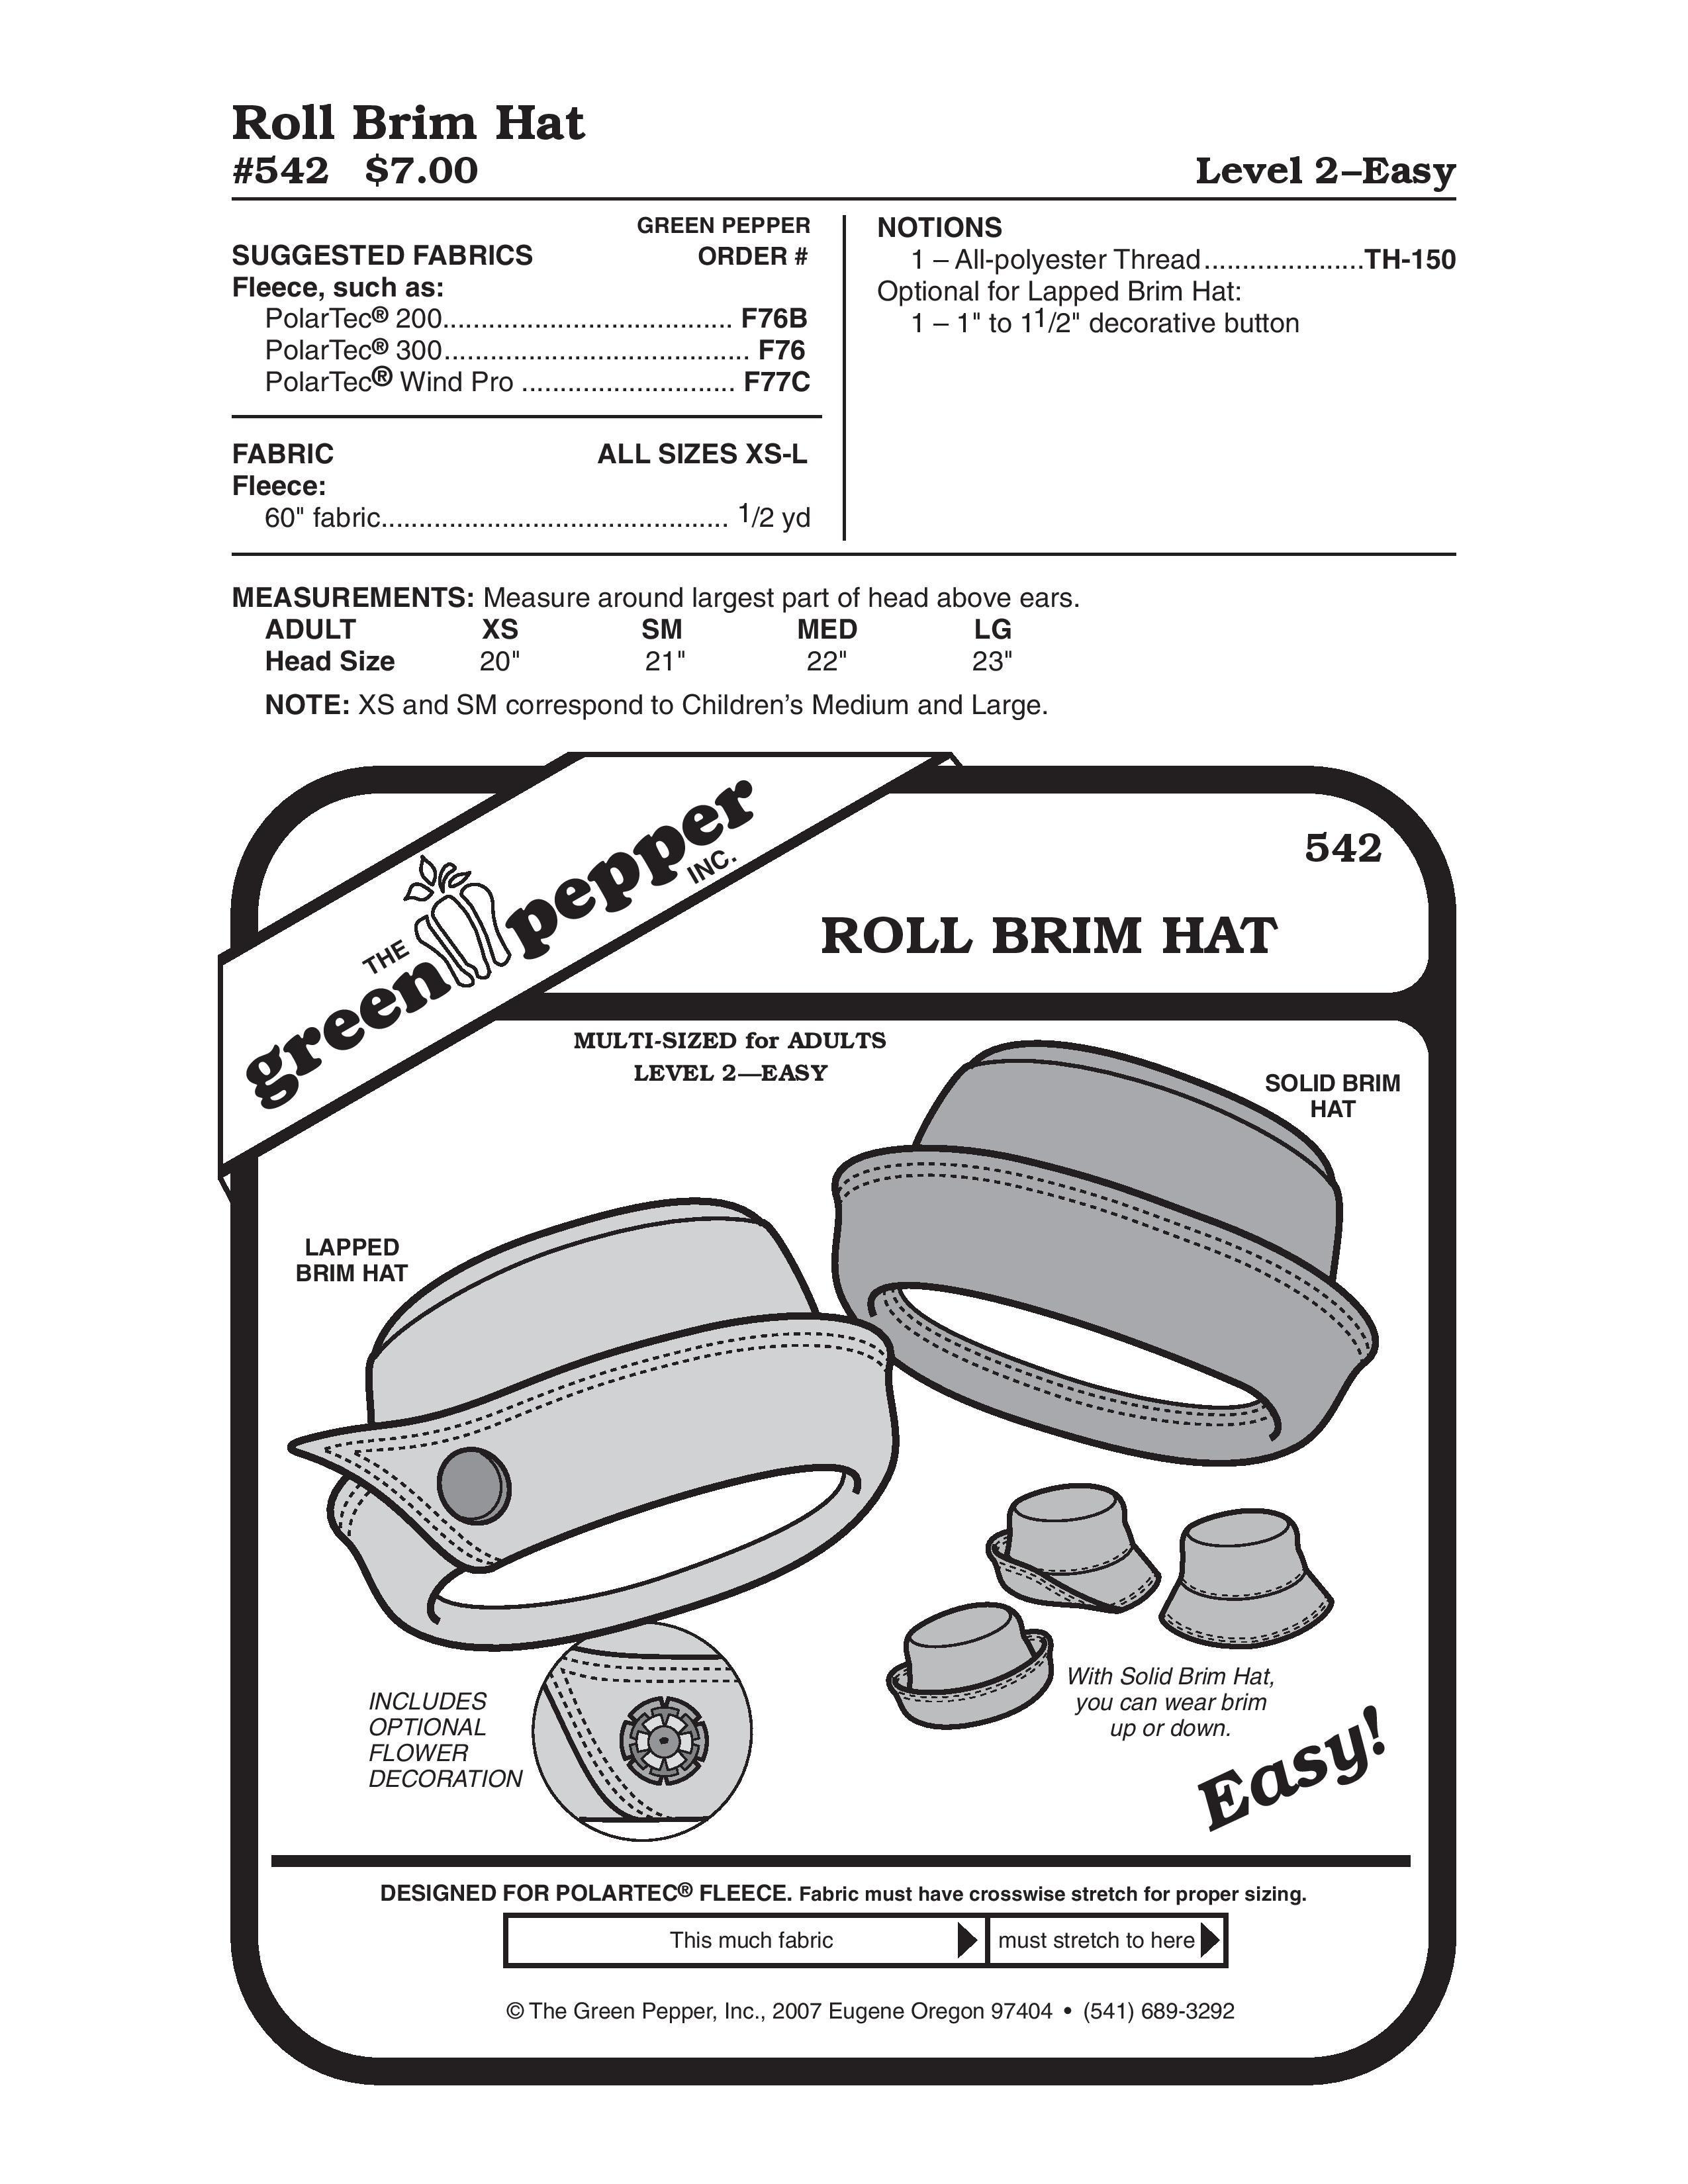 Roll Brim Hat Sewing Pattern